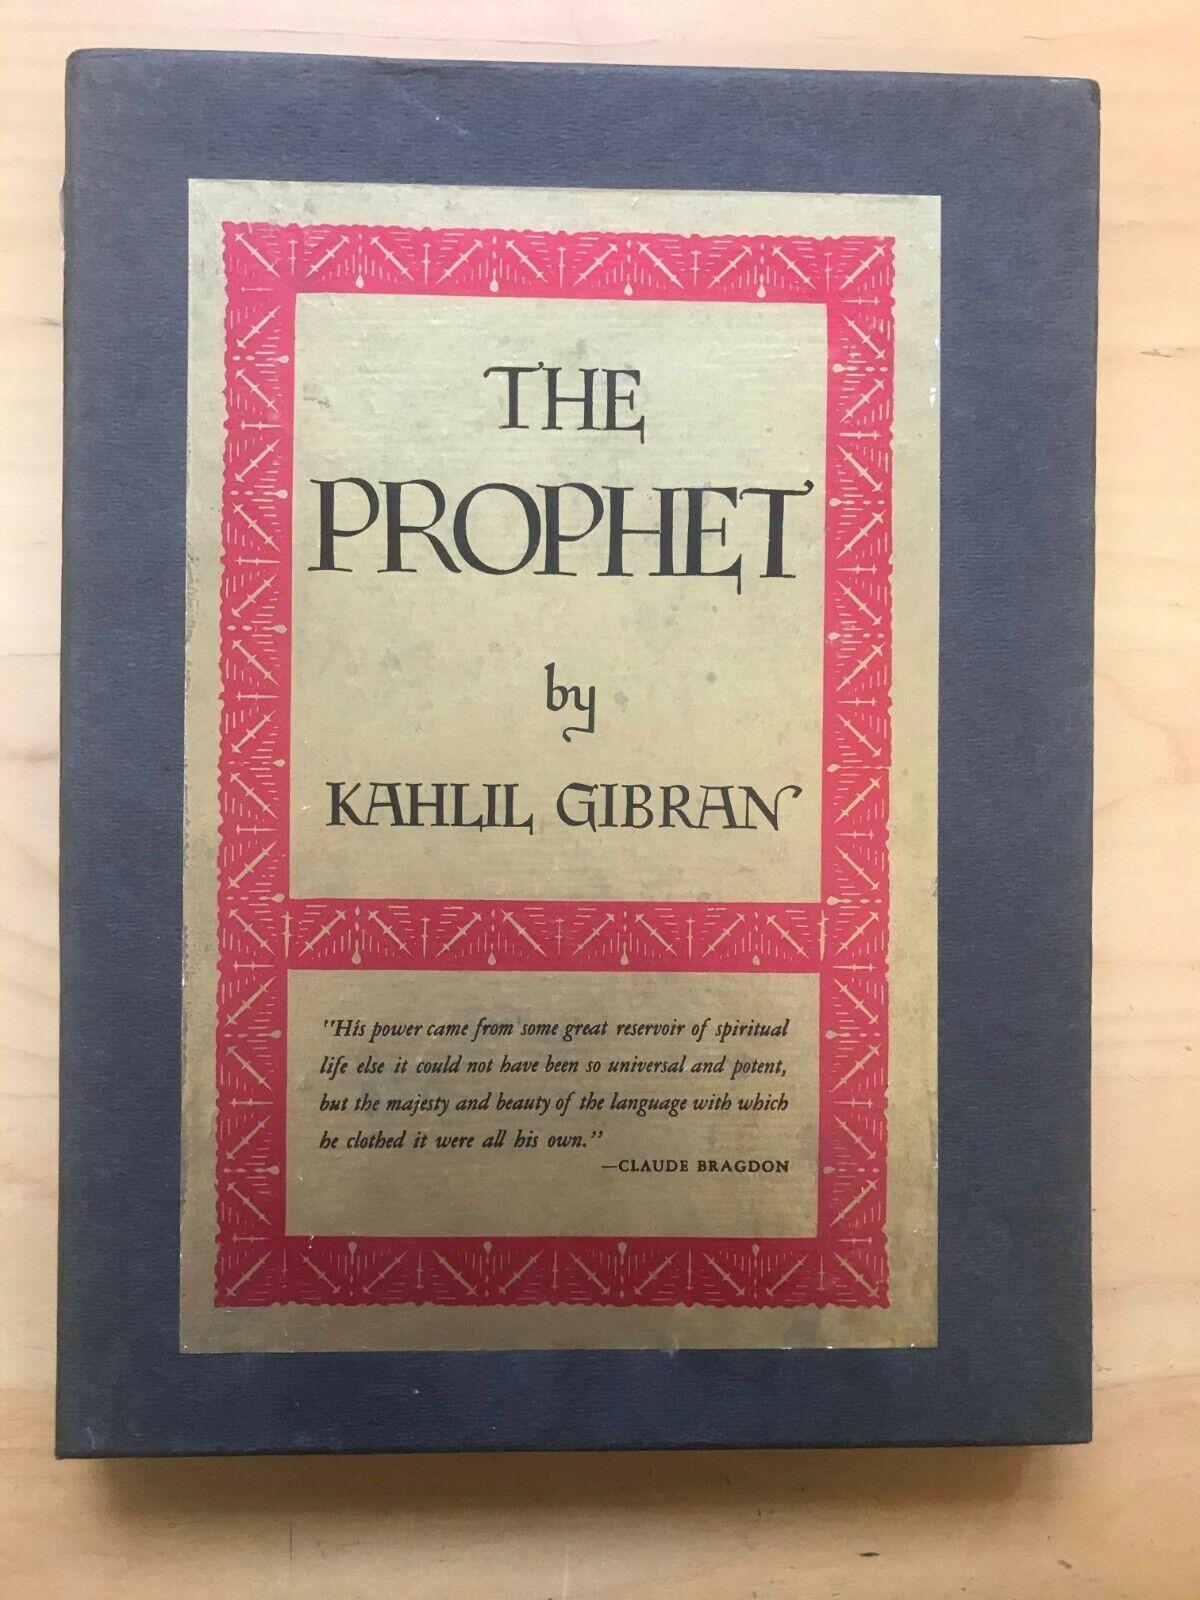 The Prophet By Kahlil Gibran 1952 Hardcover Deluxe For Sale Online Ebay